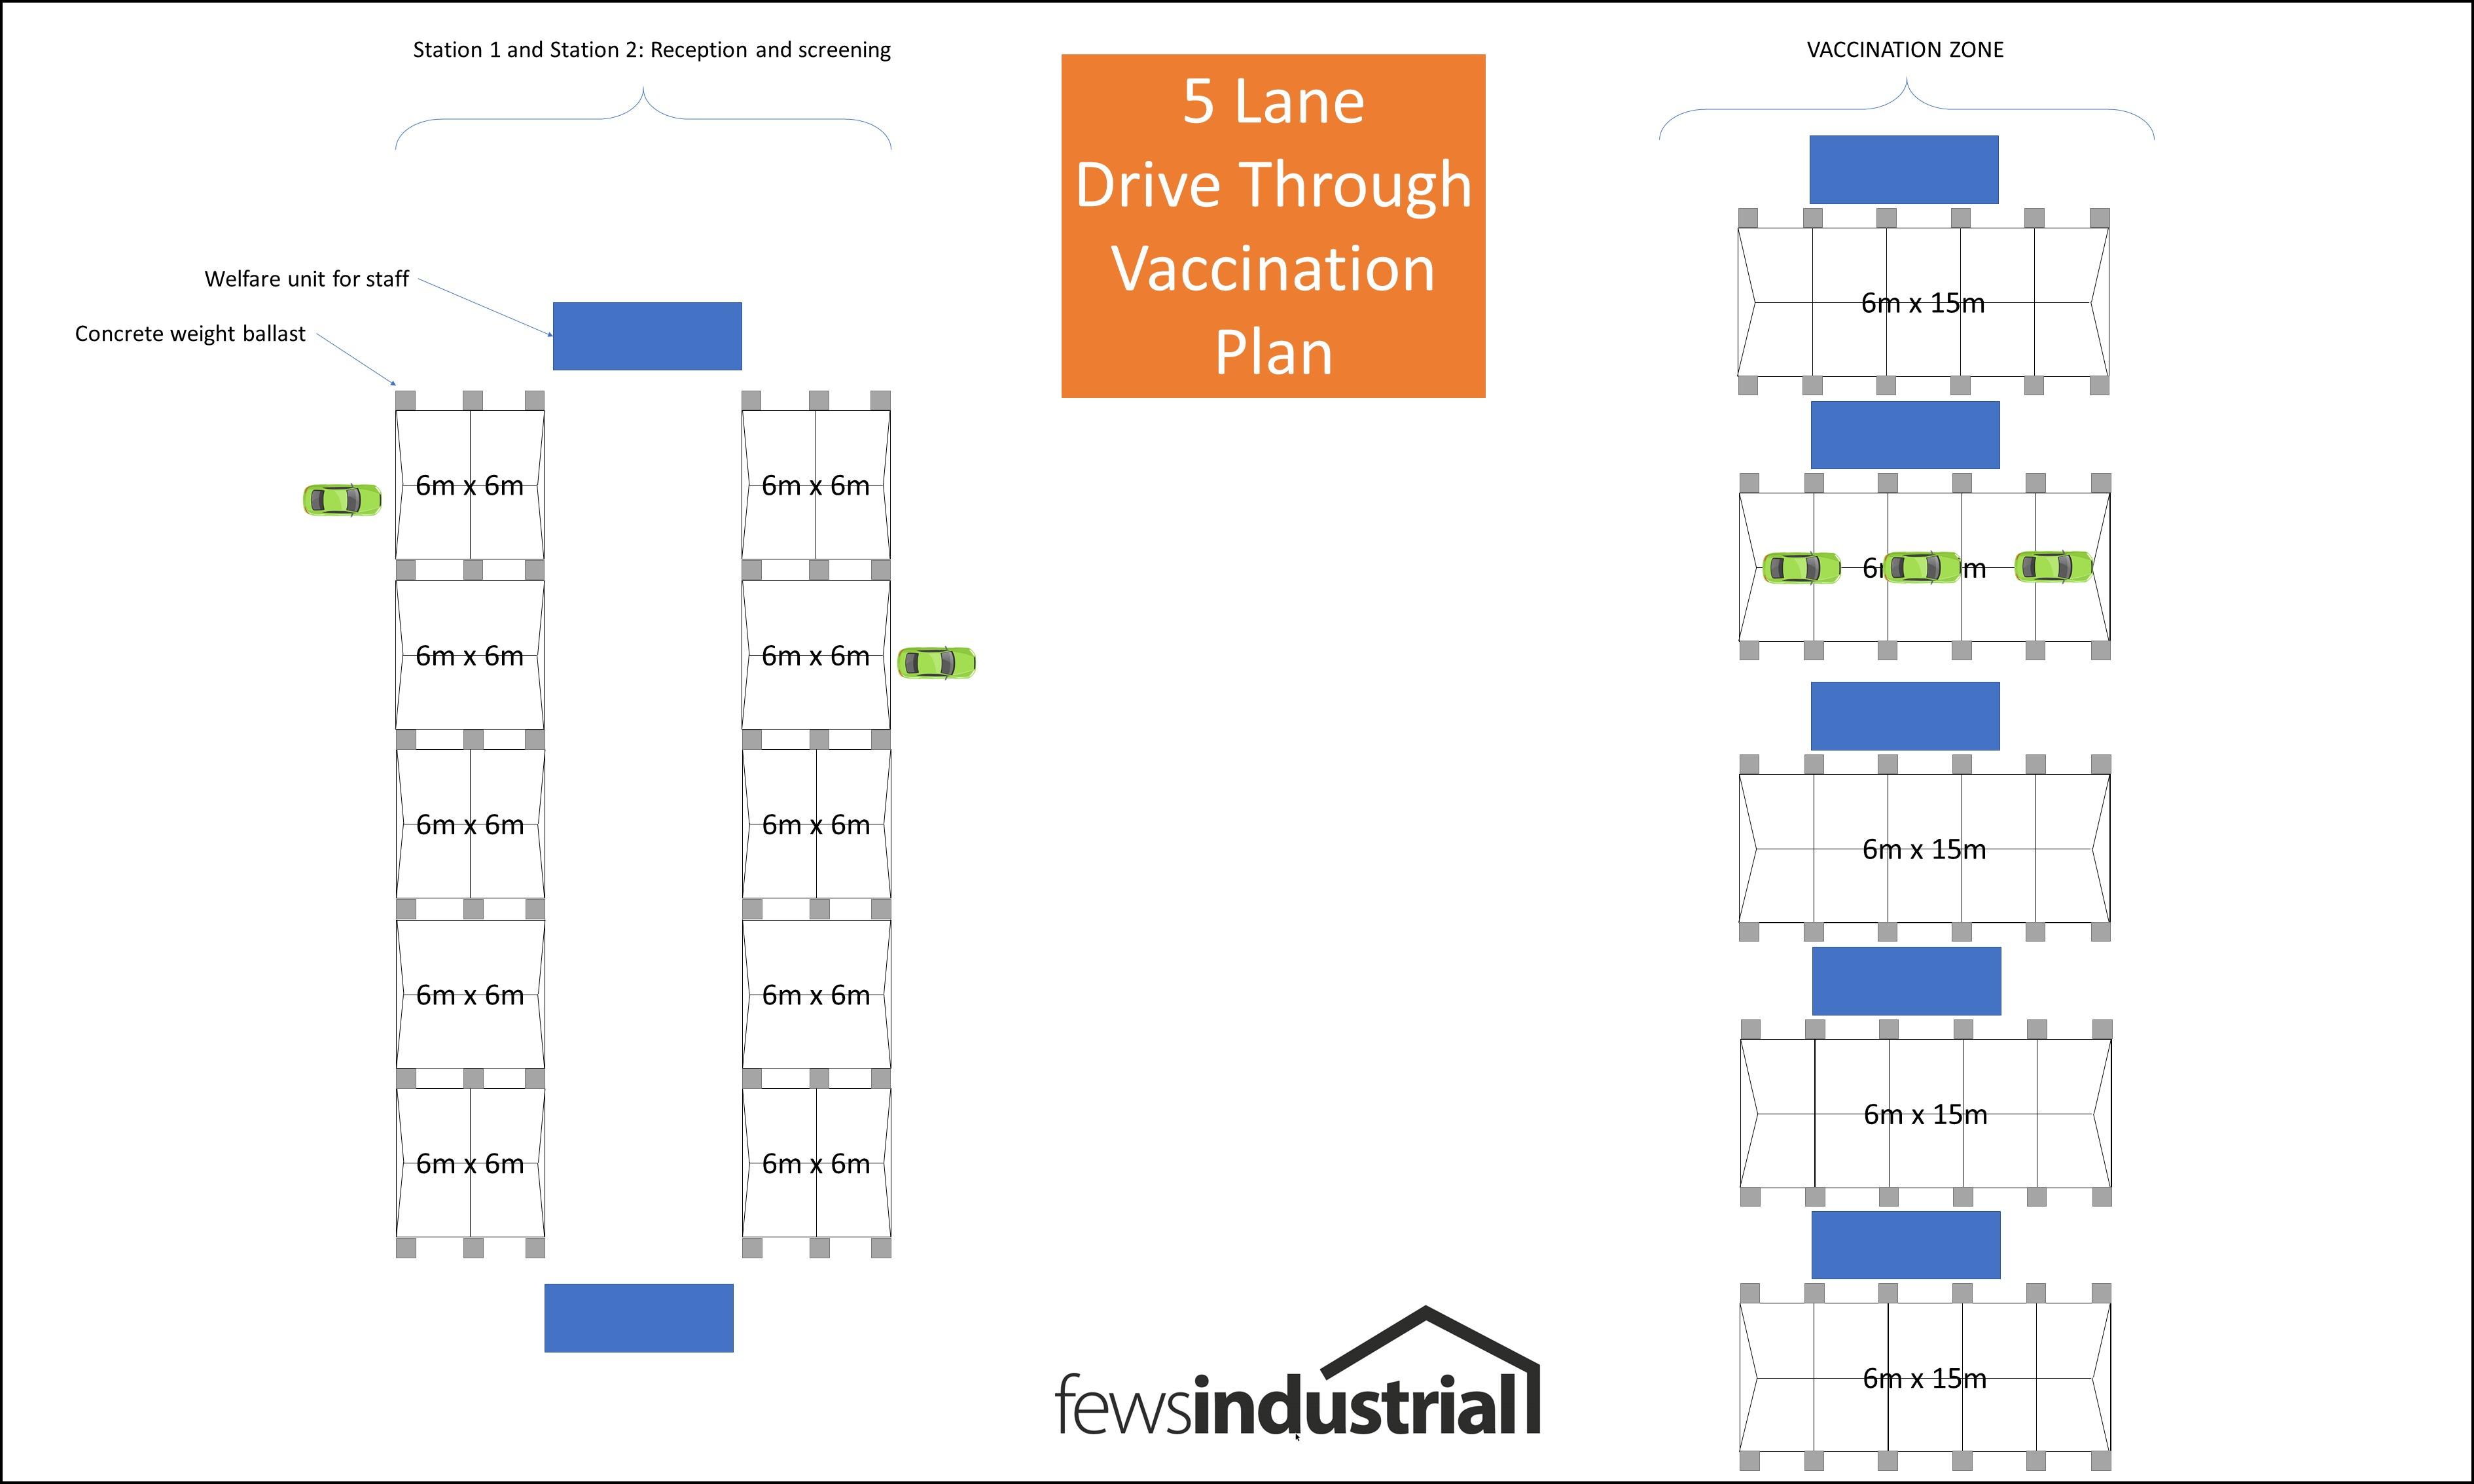 Drive Through Vaccination Plan